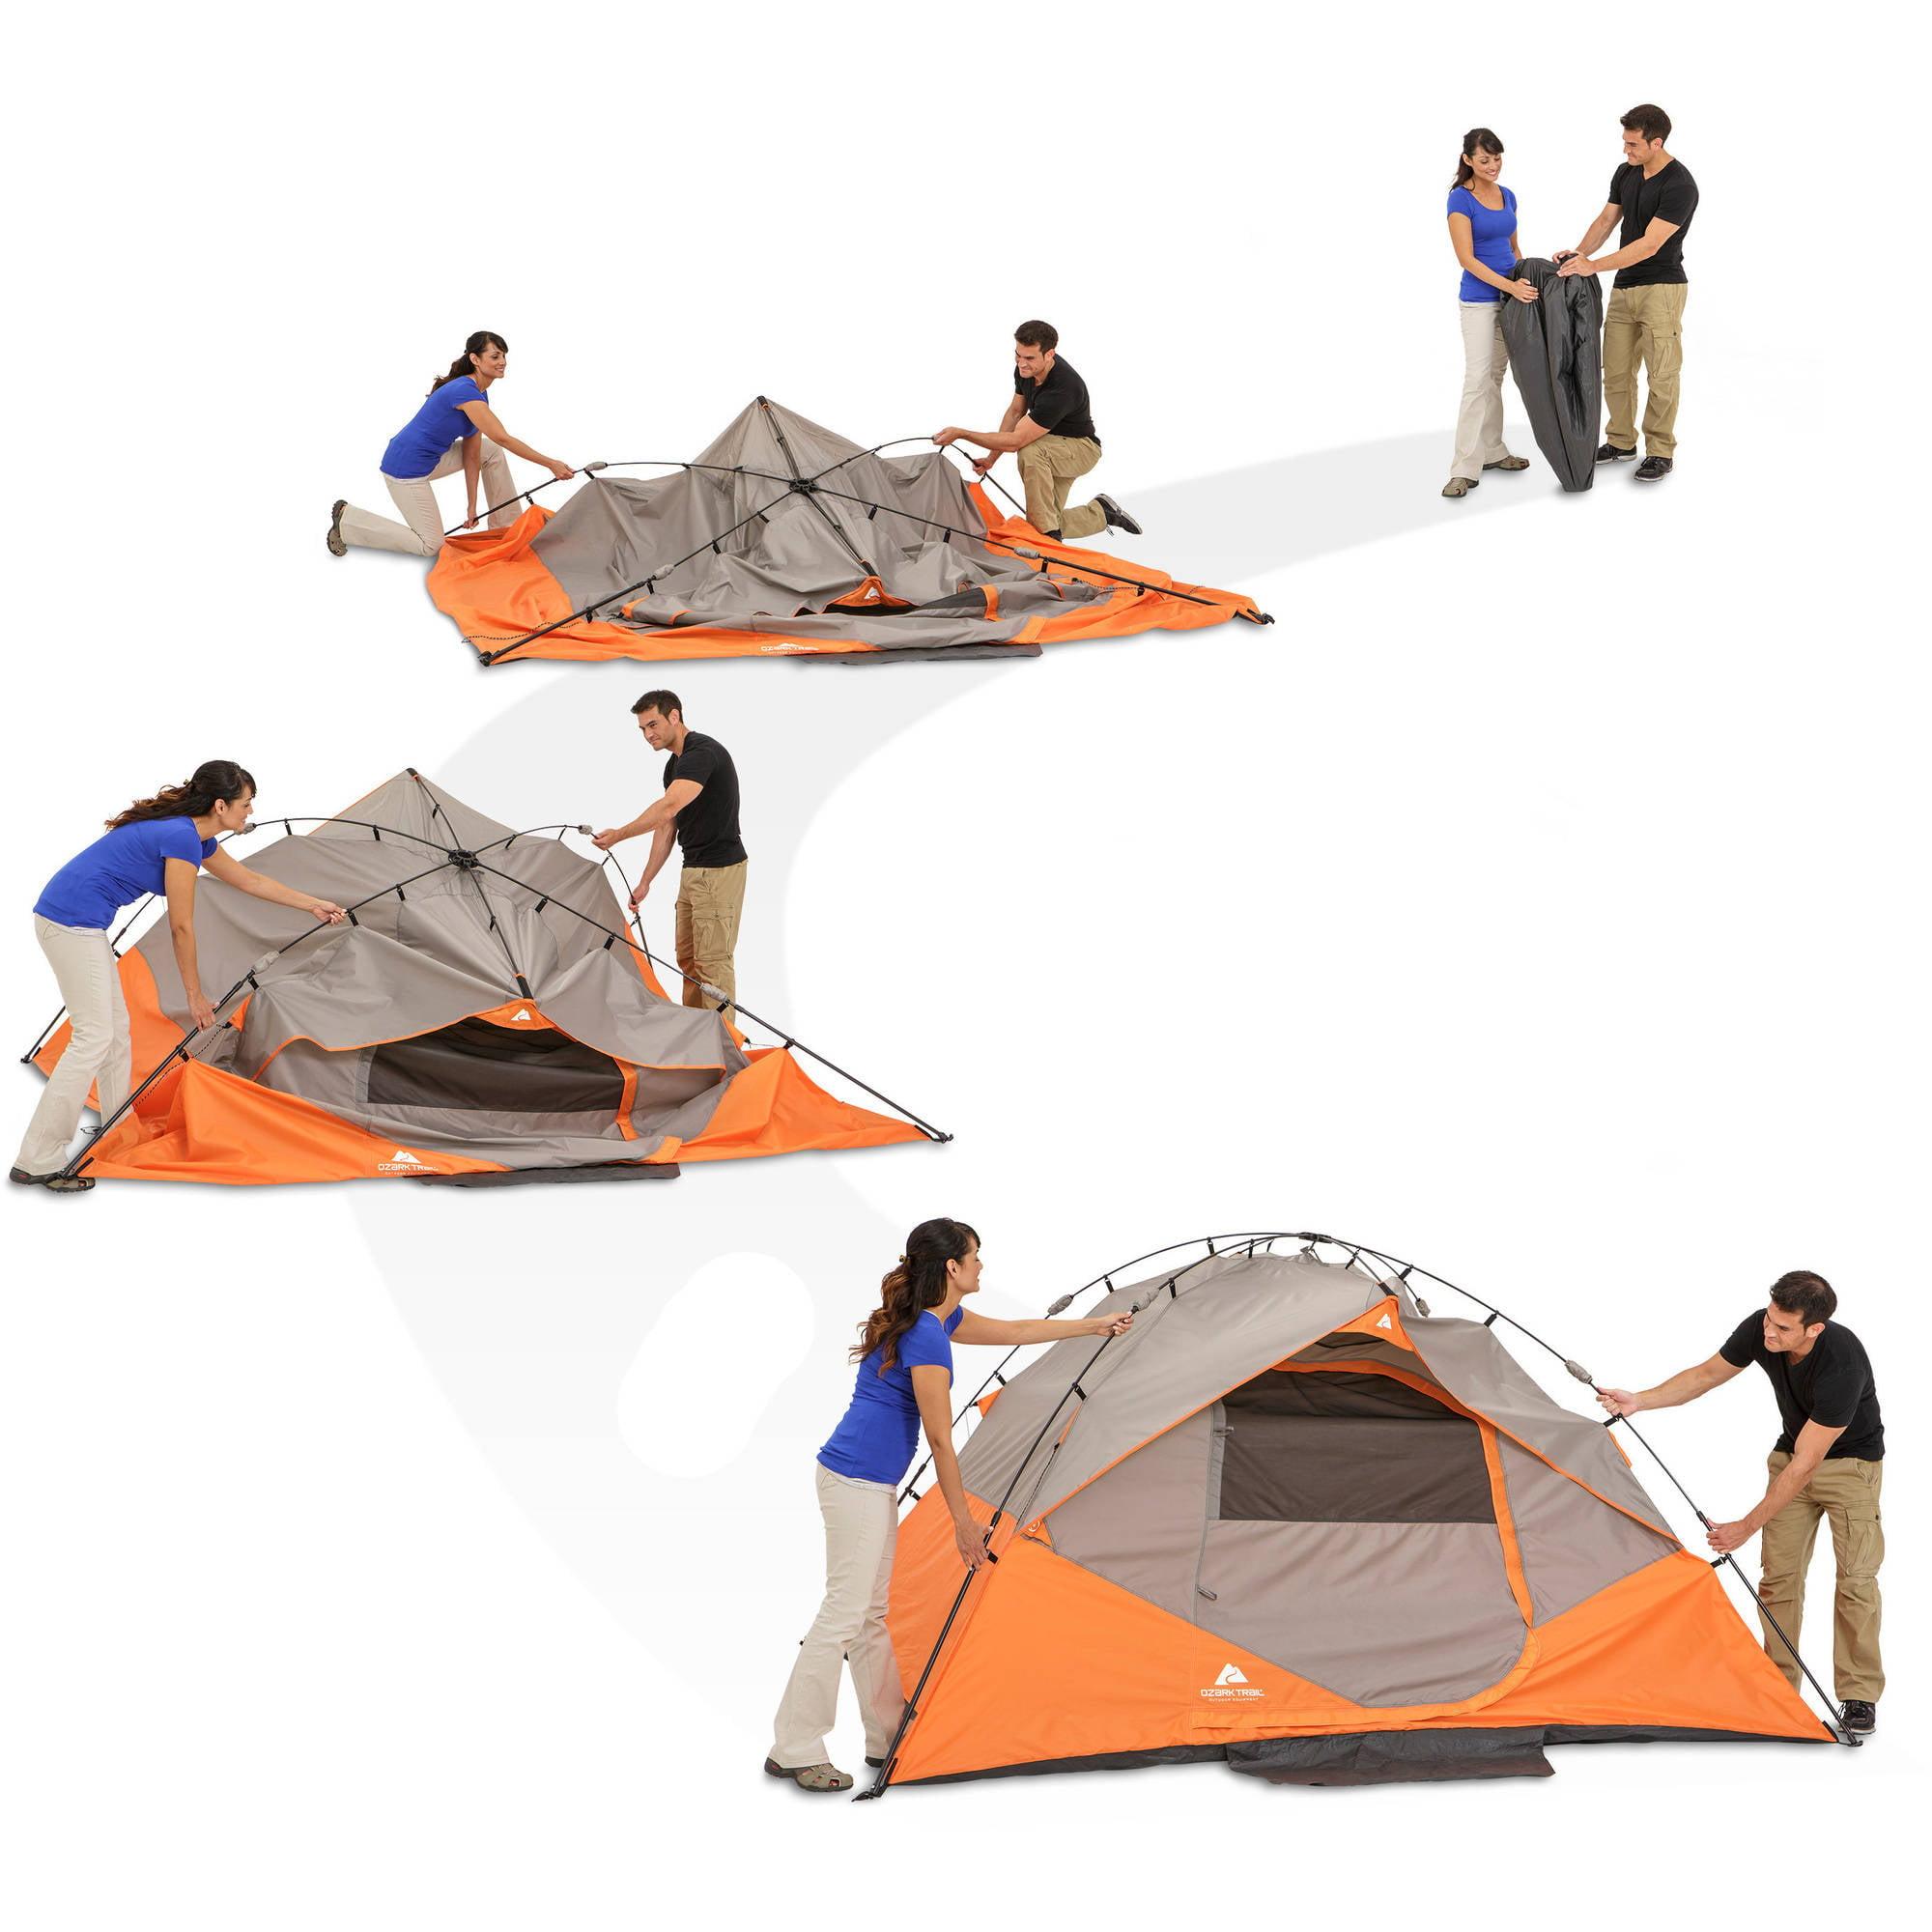 sc 1 st  Walmart.com & Ozark Trail Instant 10u0027 x 9u0027 Dome Camping Tent Sleeps 6 - Walmart.com